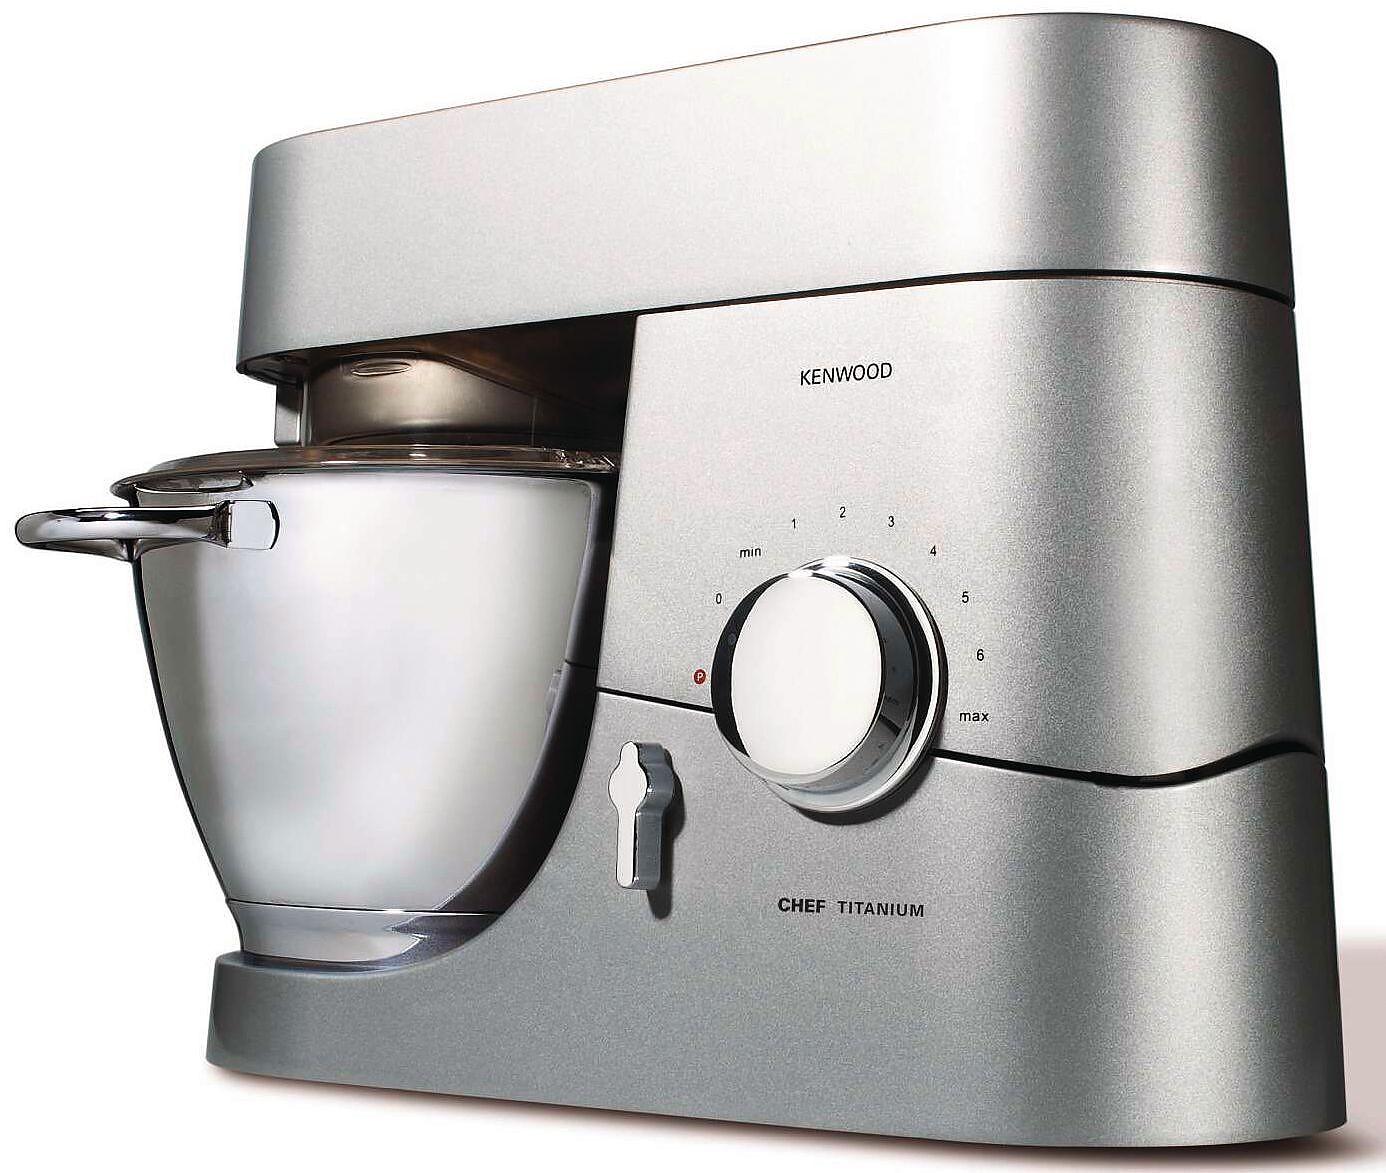 Recensione Kenwood KMC010 Chef Titanium Kitchen Machine – Opinioni ...